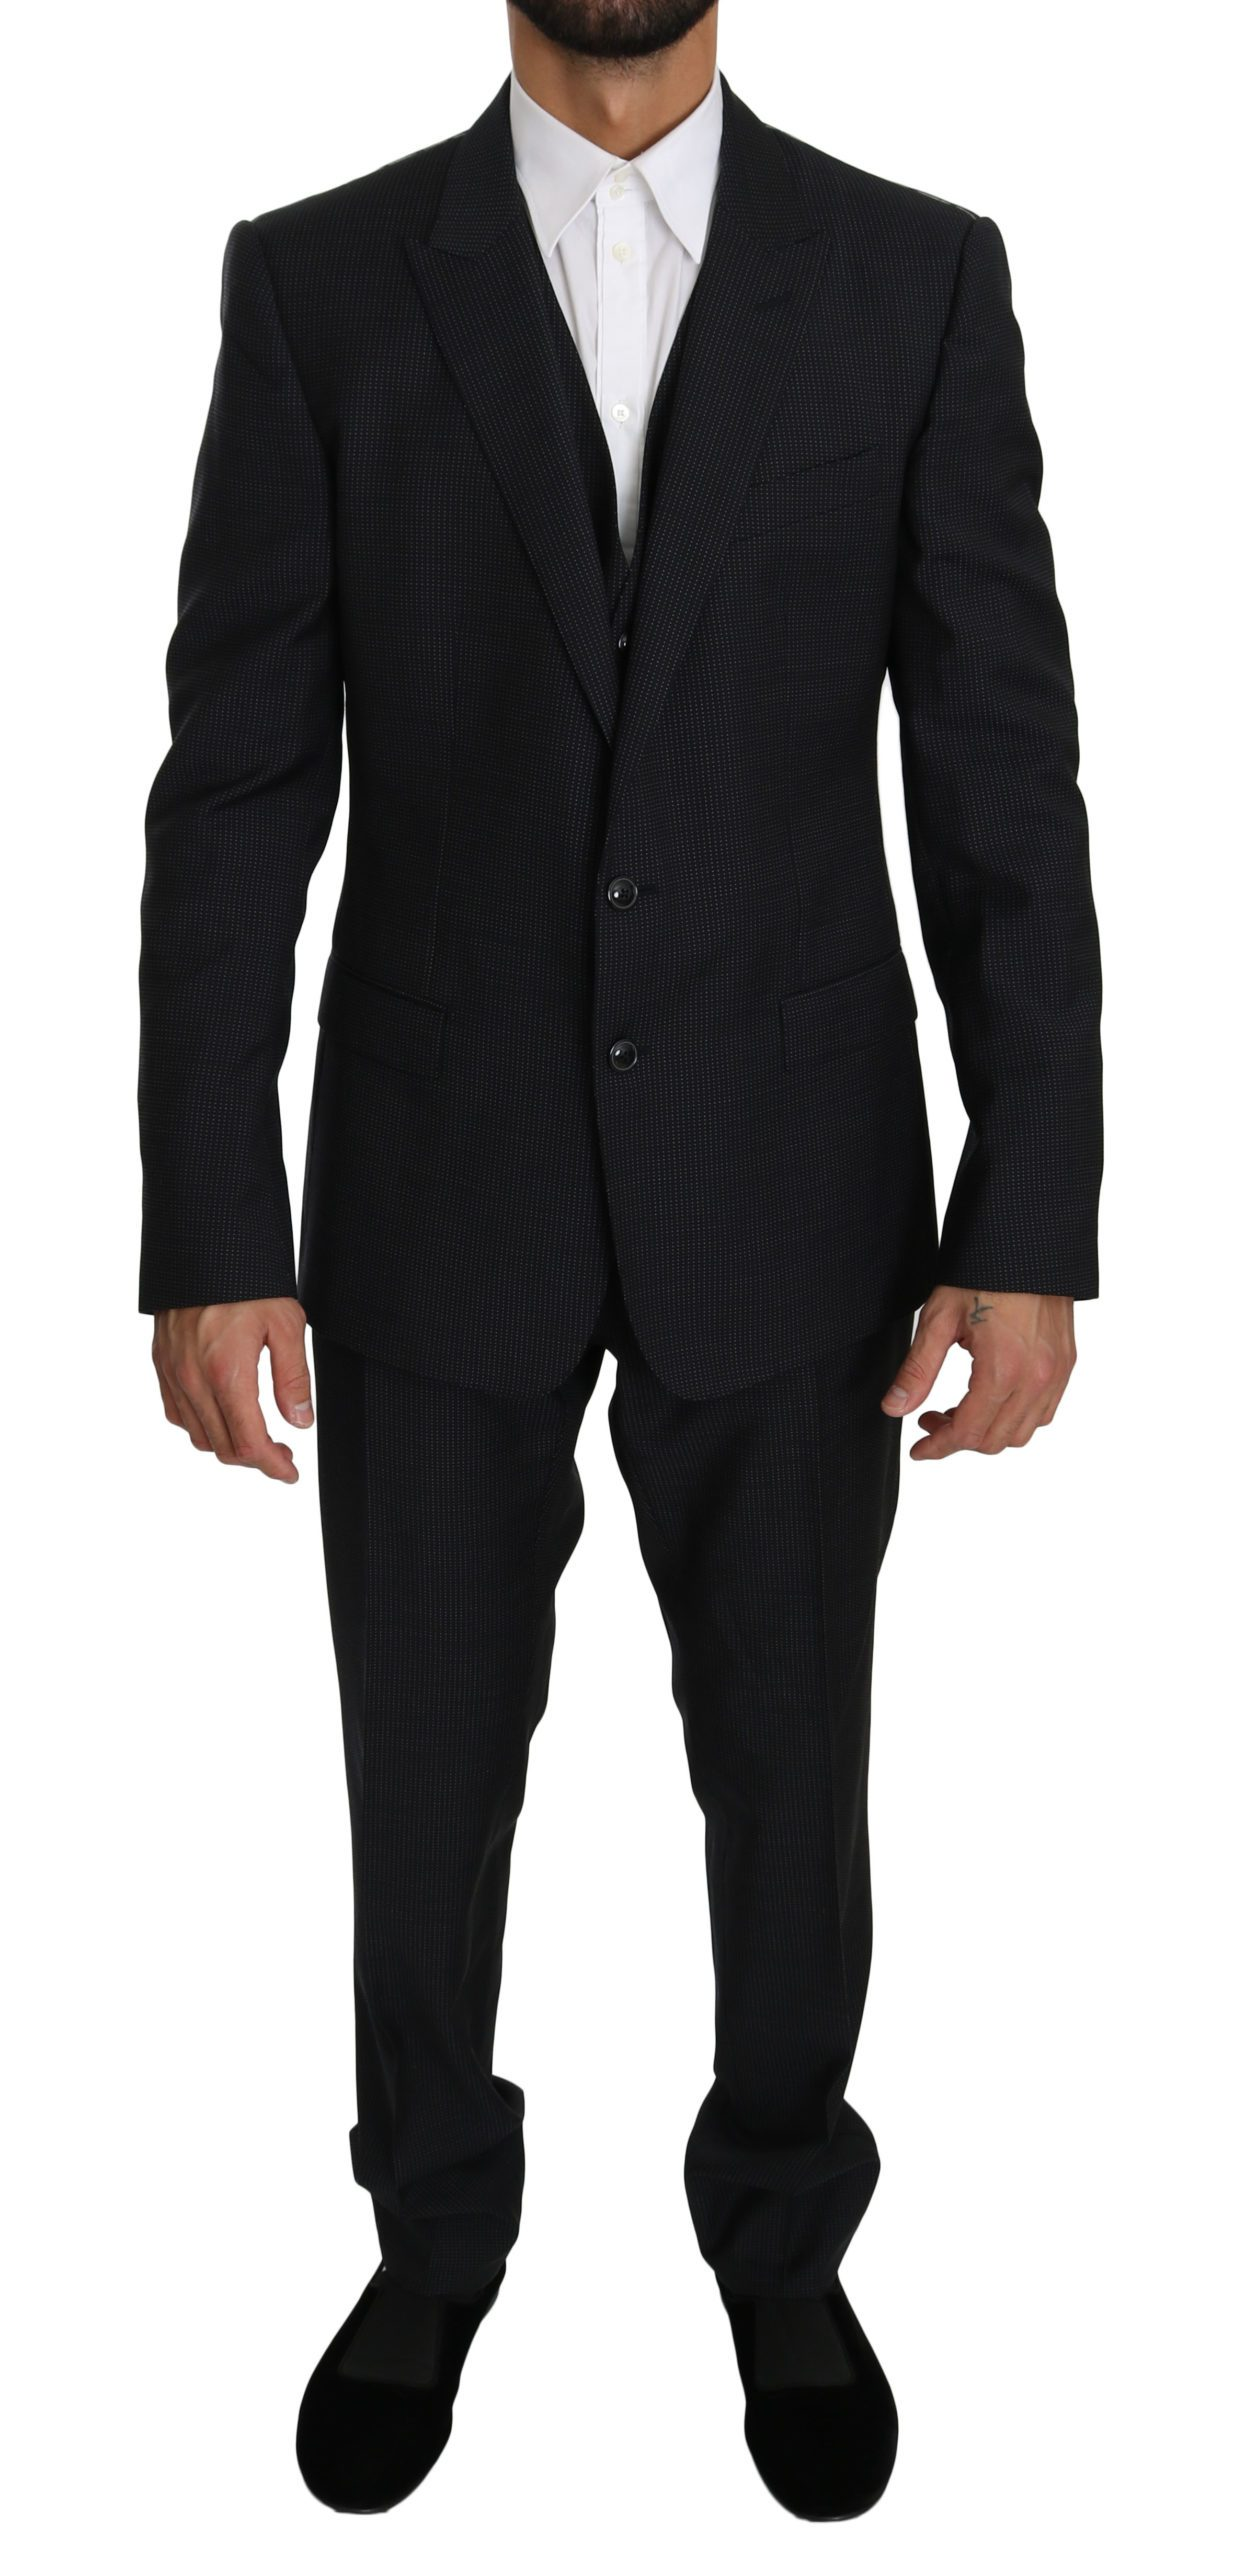 Dolce & Gabbana Men's Single Breasted 3 Piece MARTINI Suit Black KOS1554 - IT52   XL